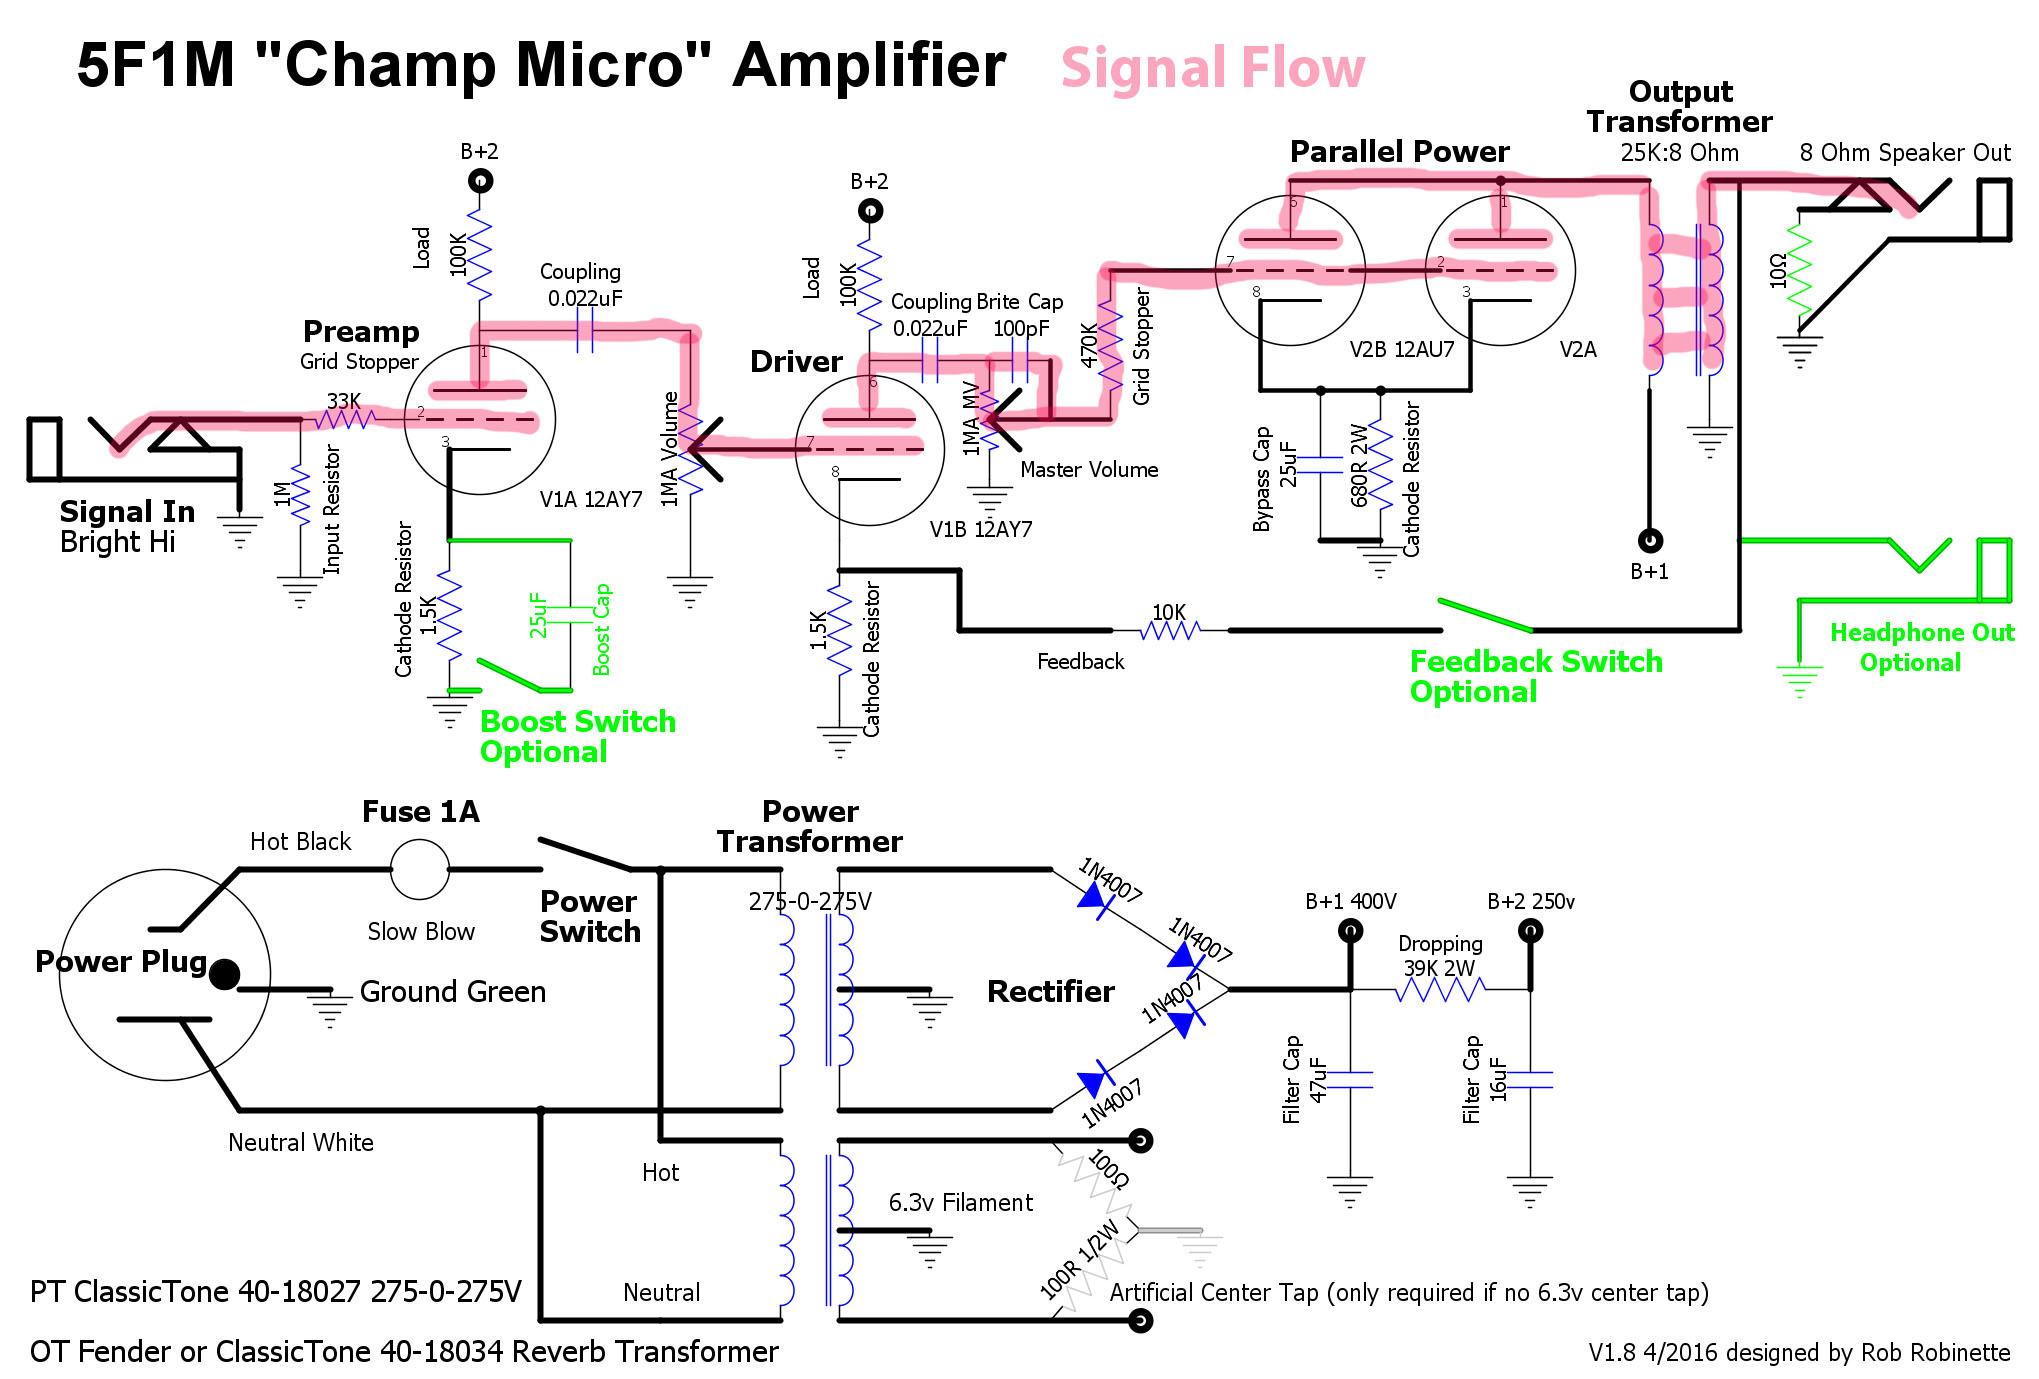 Champ Micro